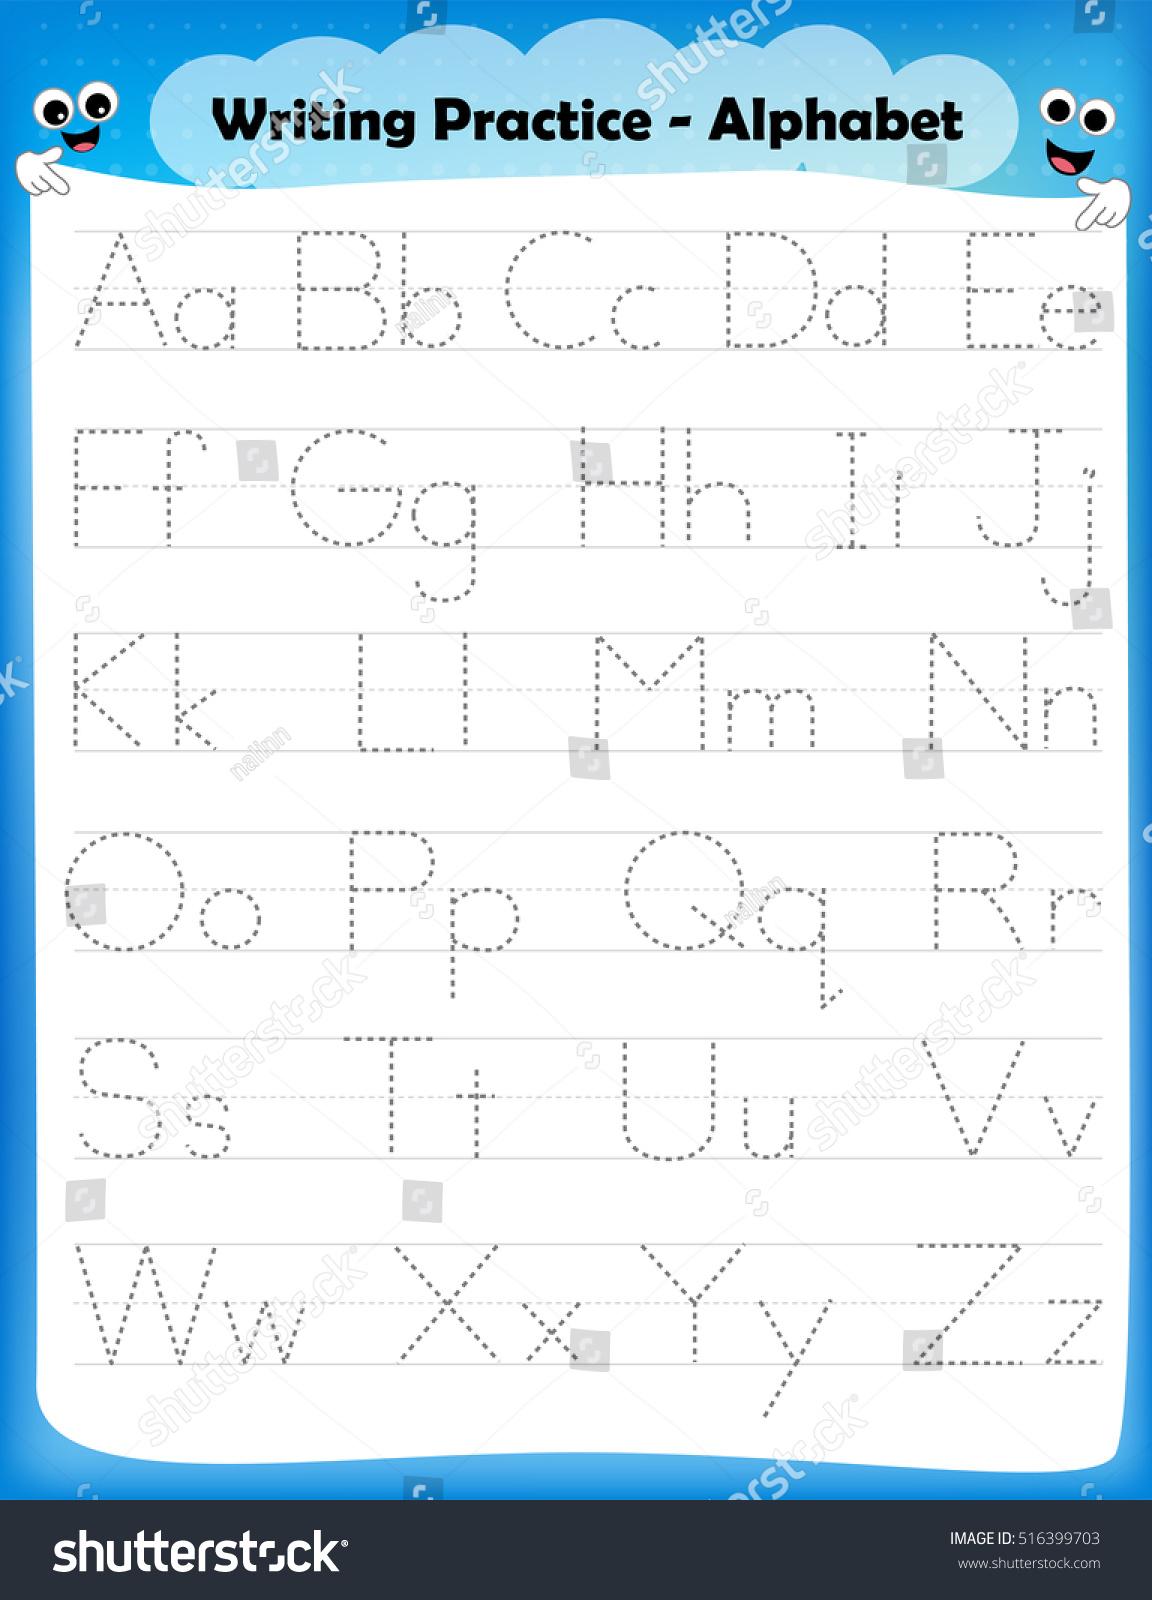 Worksheets : Alphabeters Tracing Worksheet All Stock Vector for Tracing Alphabet Letters For Kindergarten